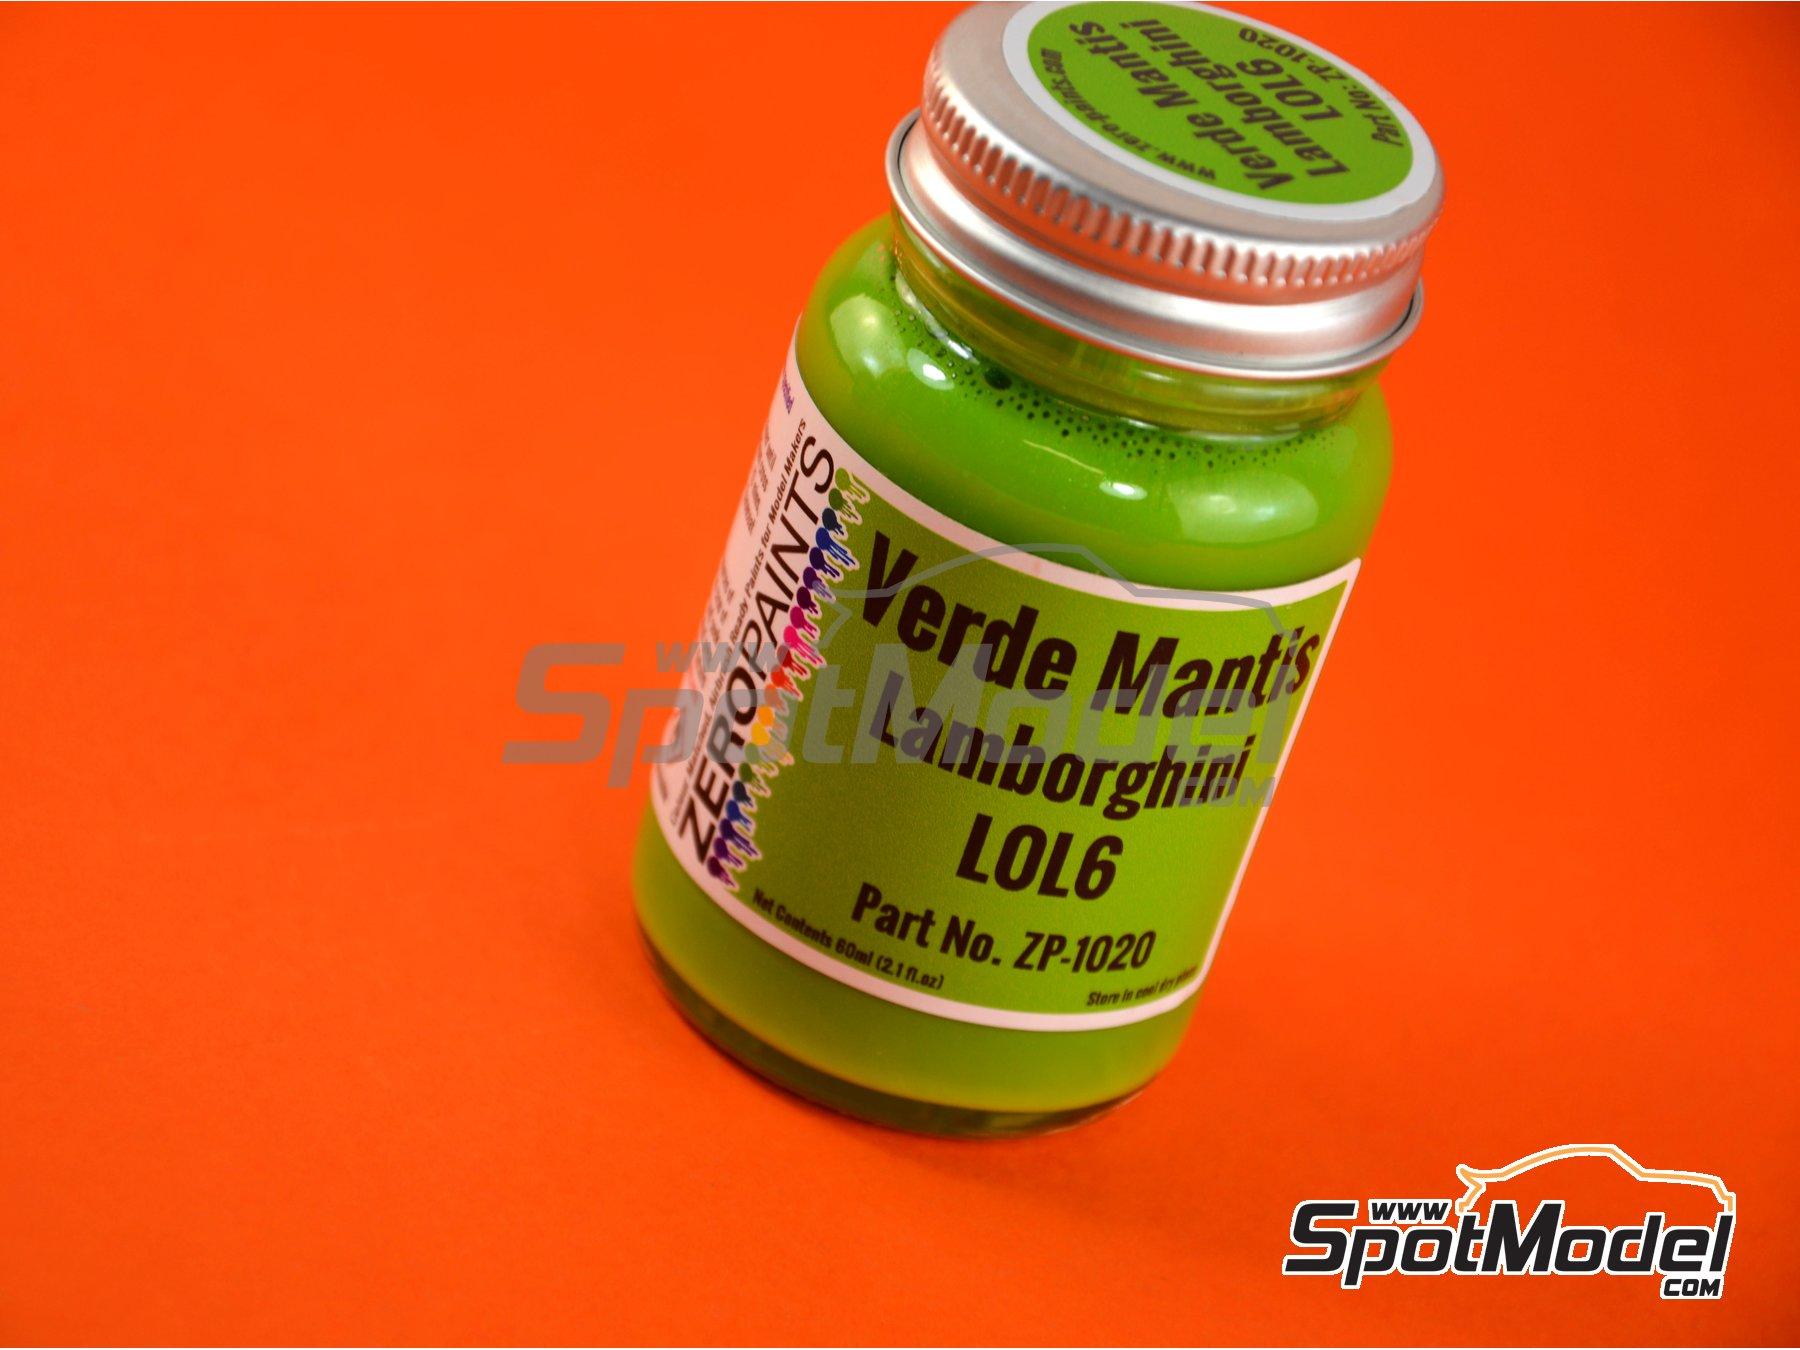 Image 1: Verde Mantis Lamborghini Huracan - Código: L0L6 | Pintura fabricado por Zero Paints (ref.ZP-1020-L0L6)